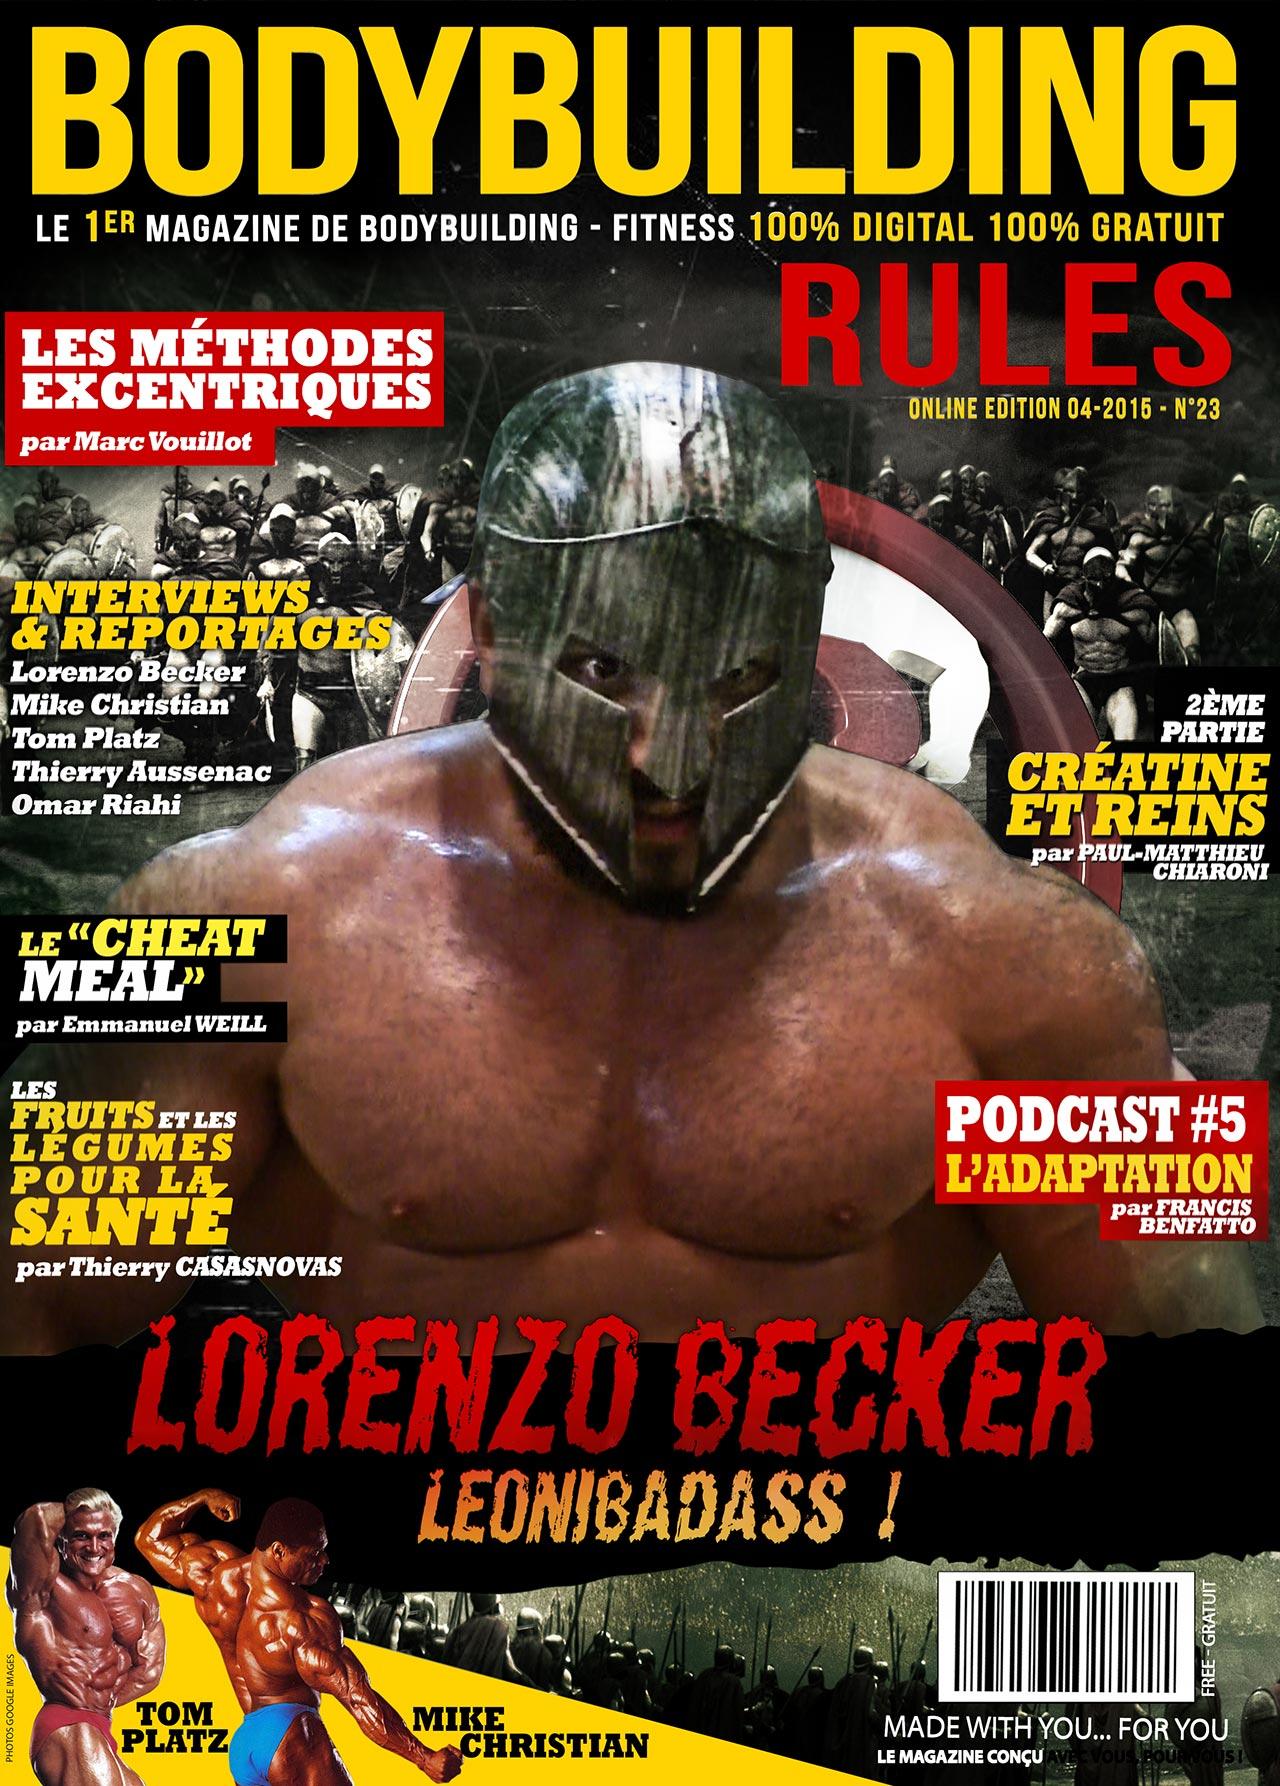 bodybuilding - www.bodybuilding-rules.com le magazine interactif GRATUIT  1bbrM23